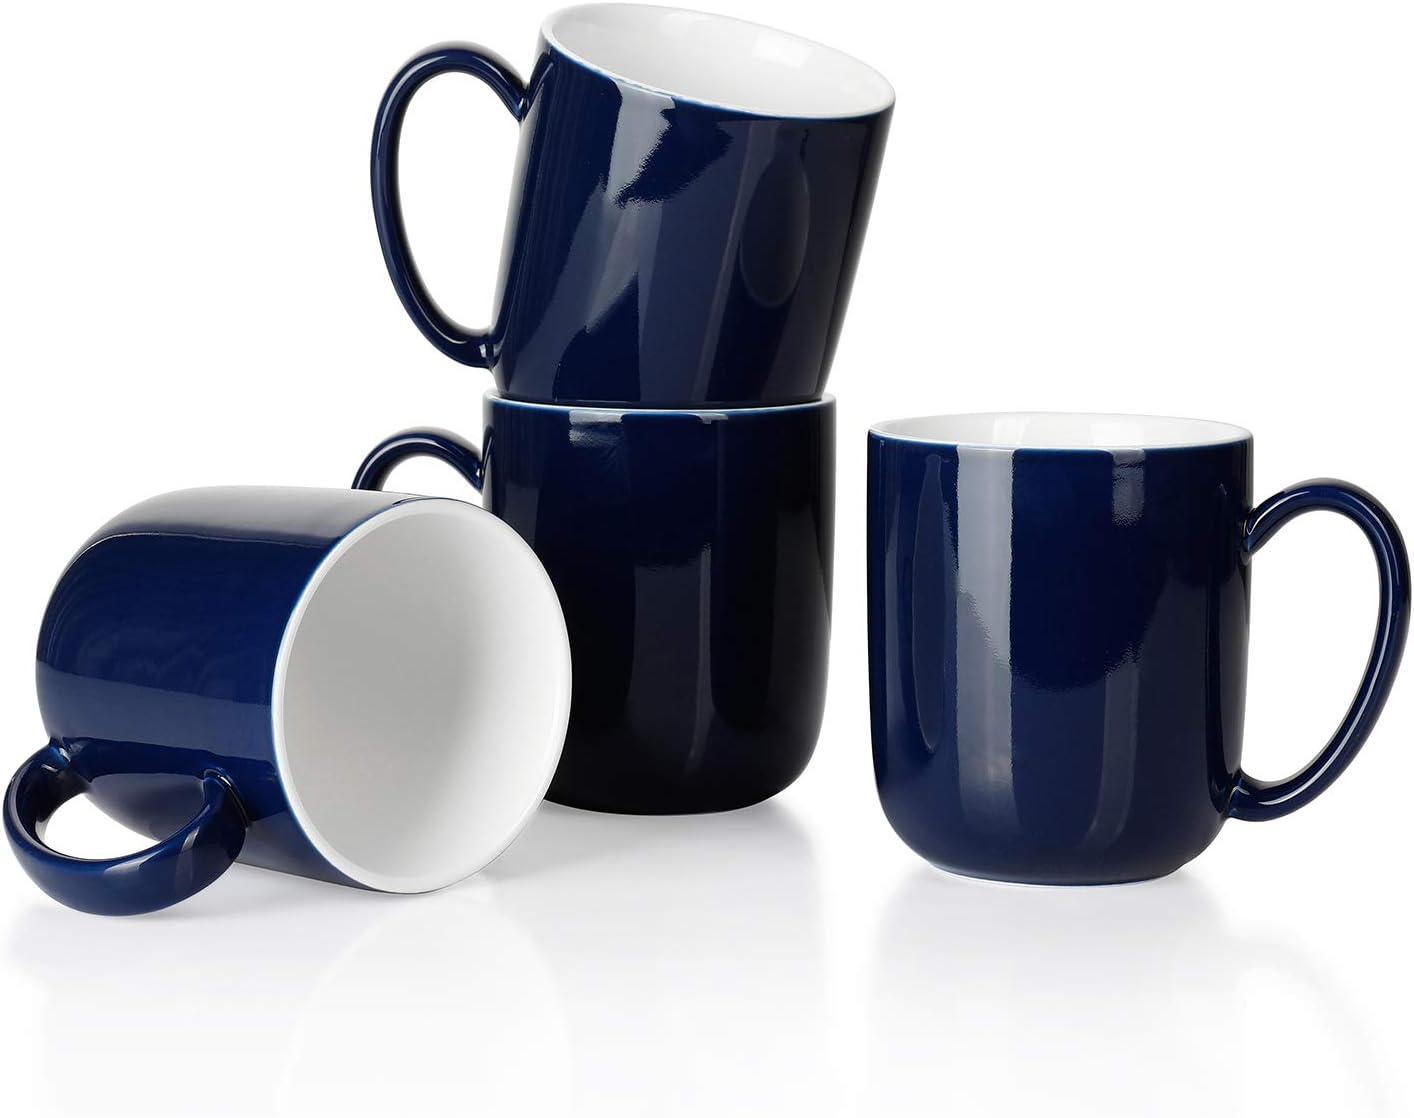 Sweese 604.404 Porcelain Translated Mugs for Cocoa Ounce Max 61% OFF Coffee Tea 15